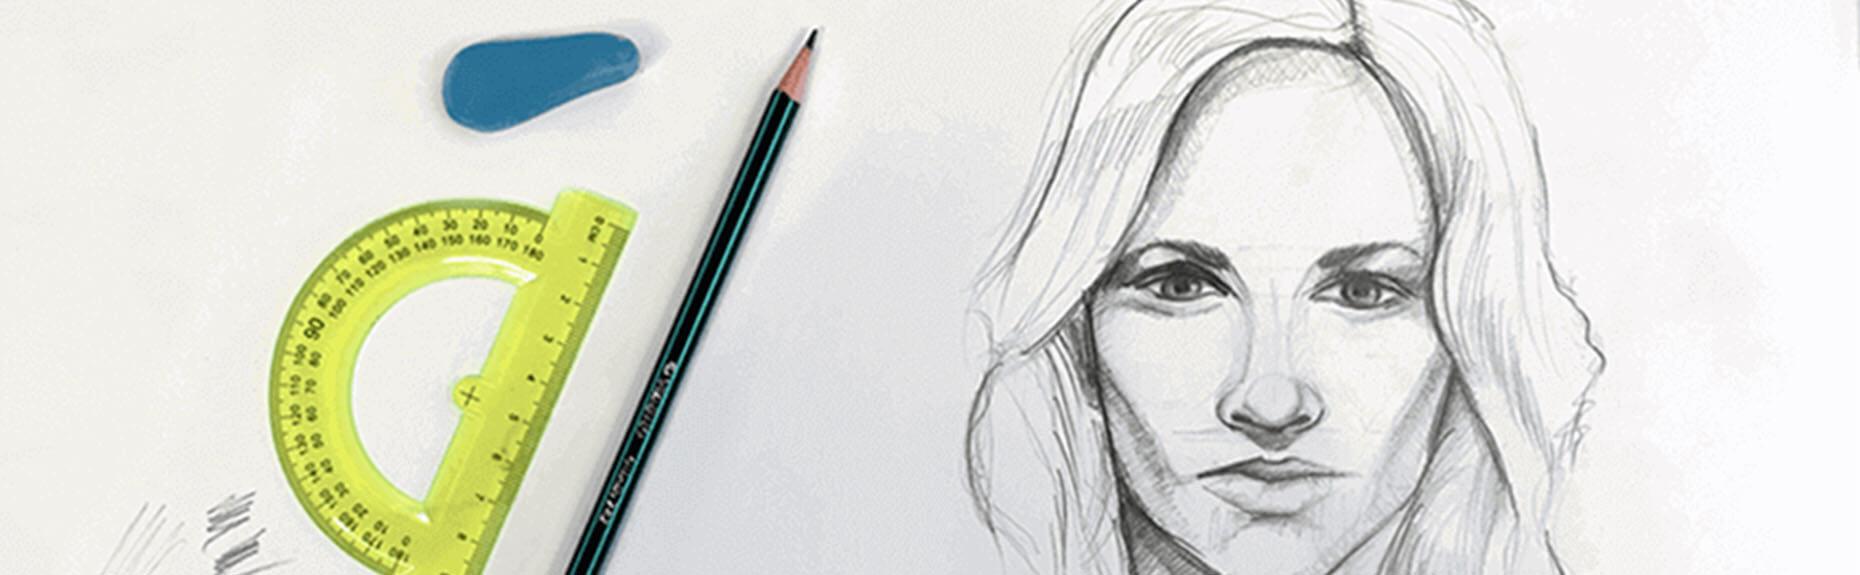 Blog-Portret-header_jpg.jpg